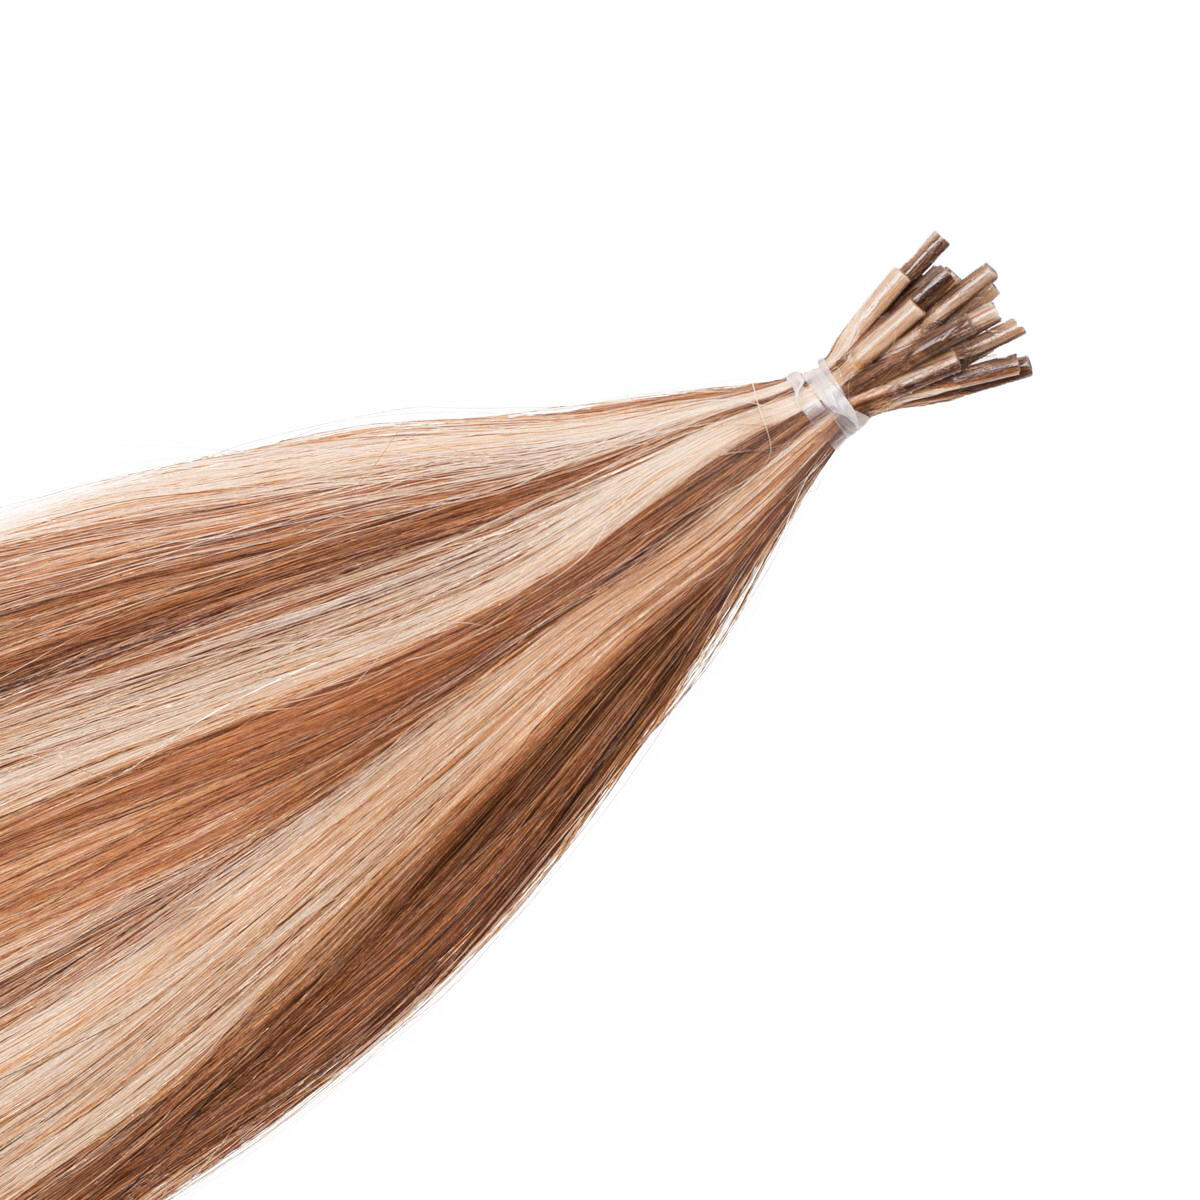 Stick Hair M5.4/7.8 Strawberry Brown Mix 50 cm